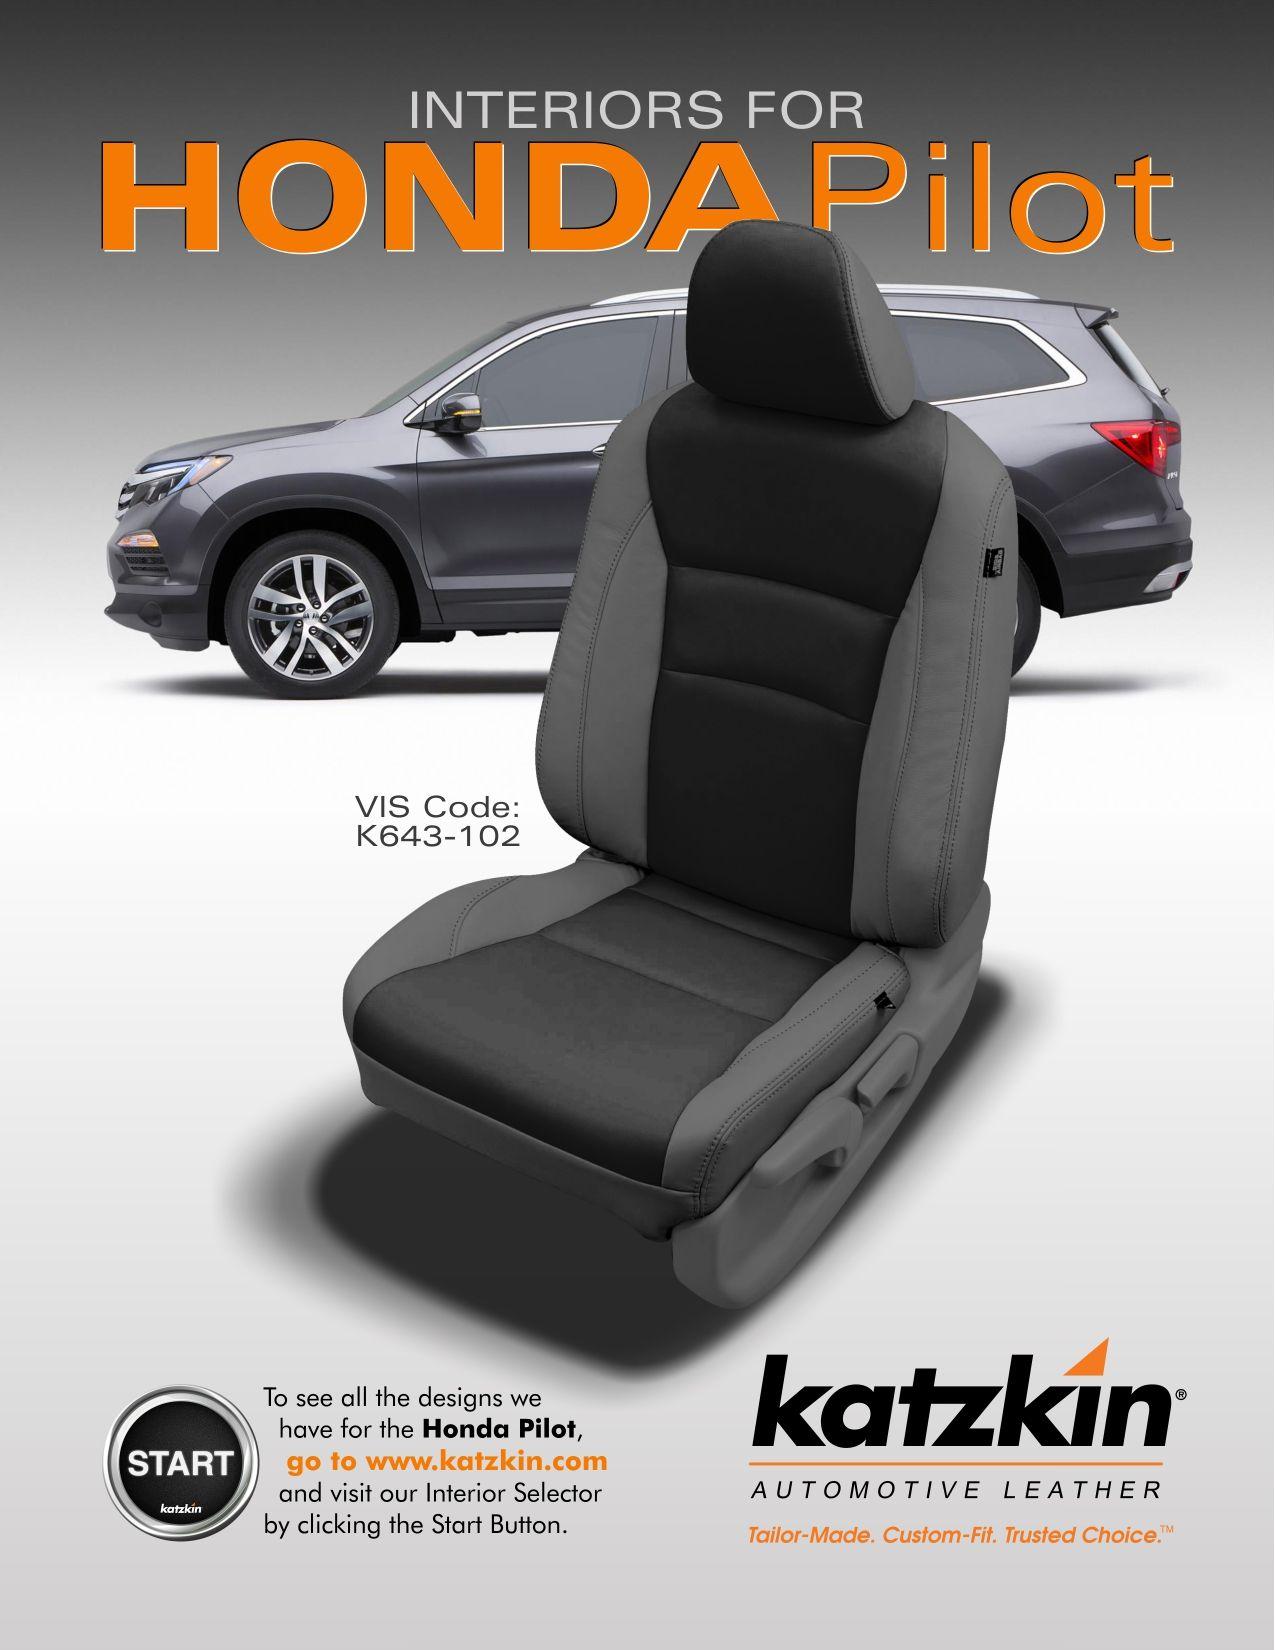 2016 Honda Pilot (E-Brochure)